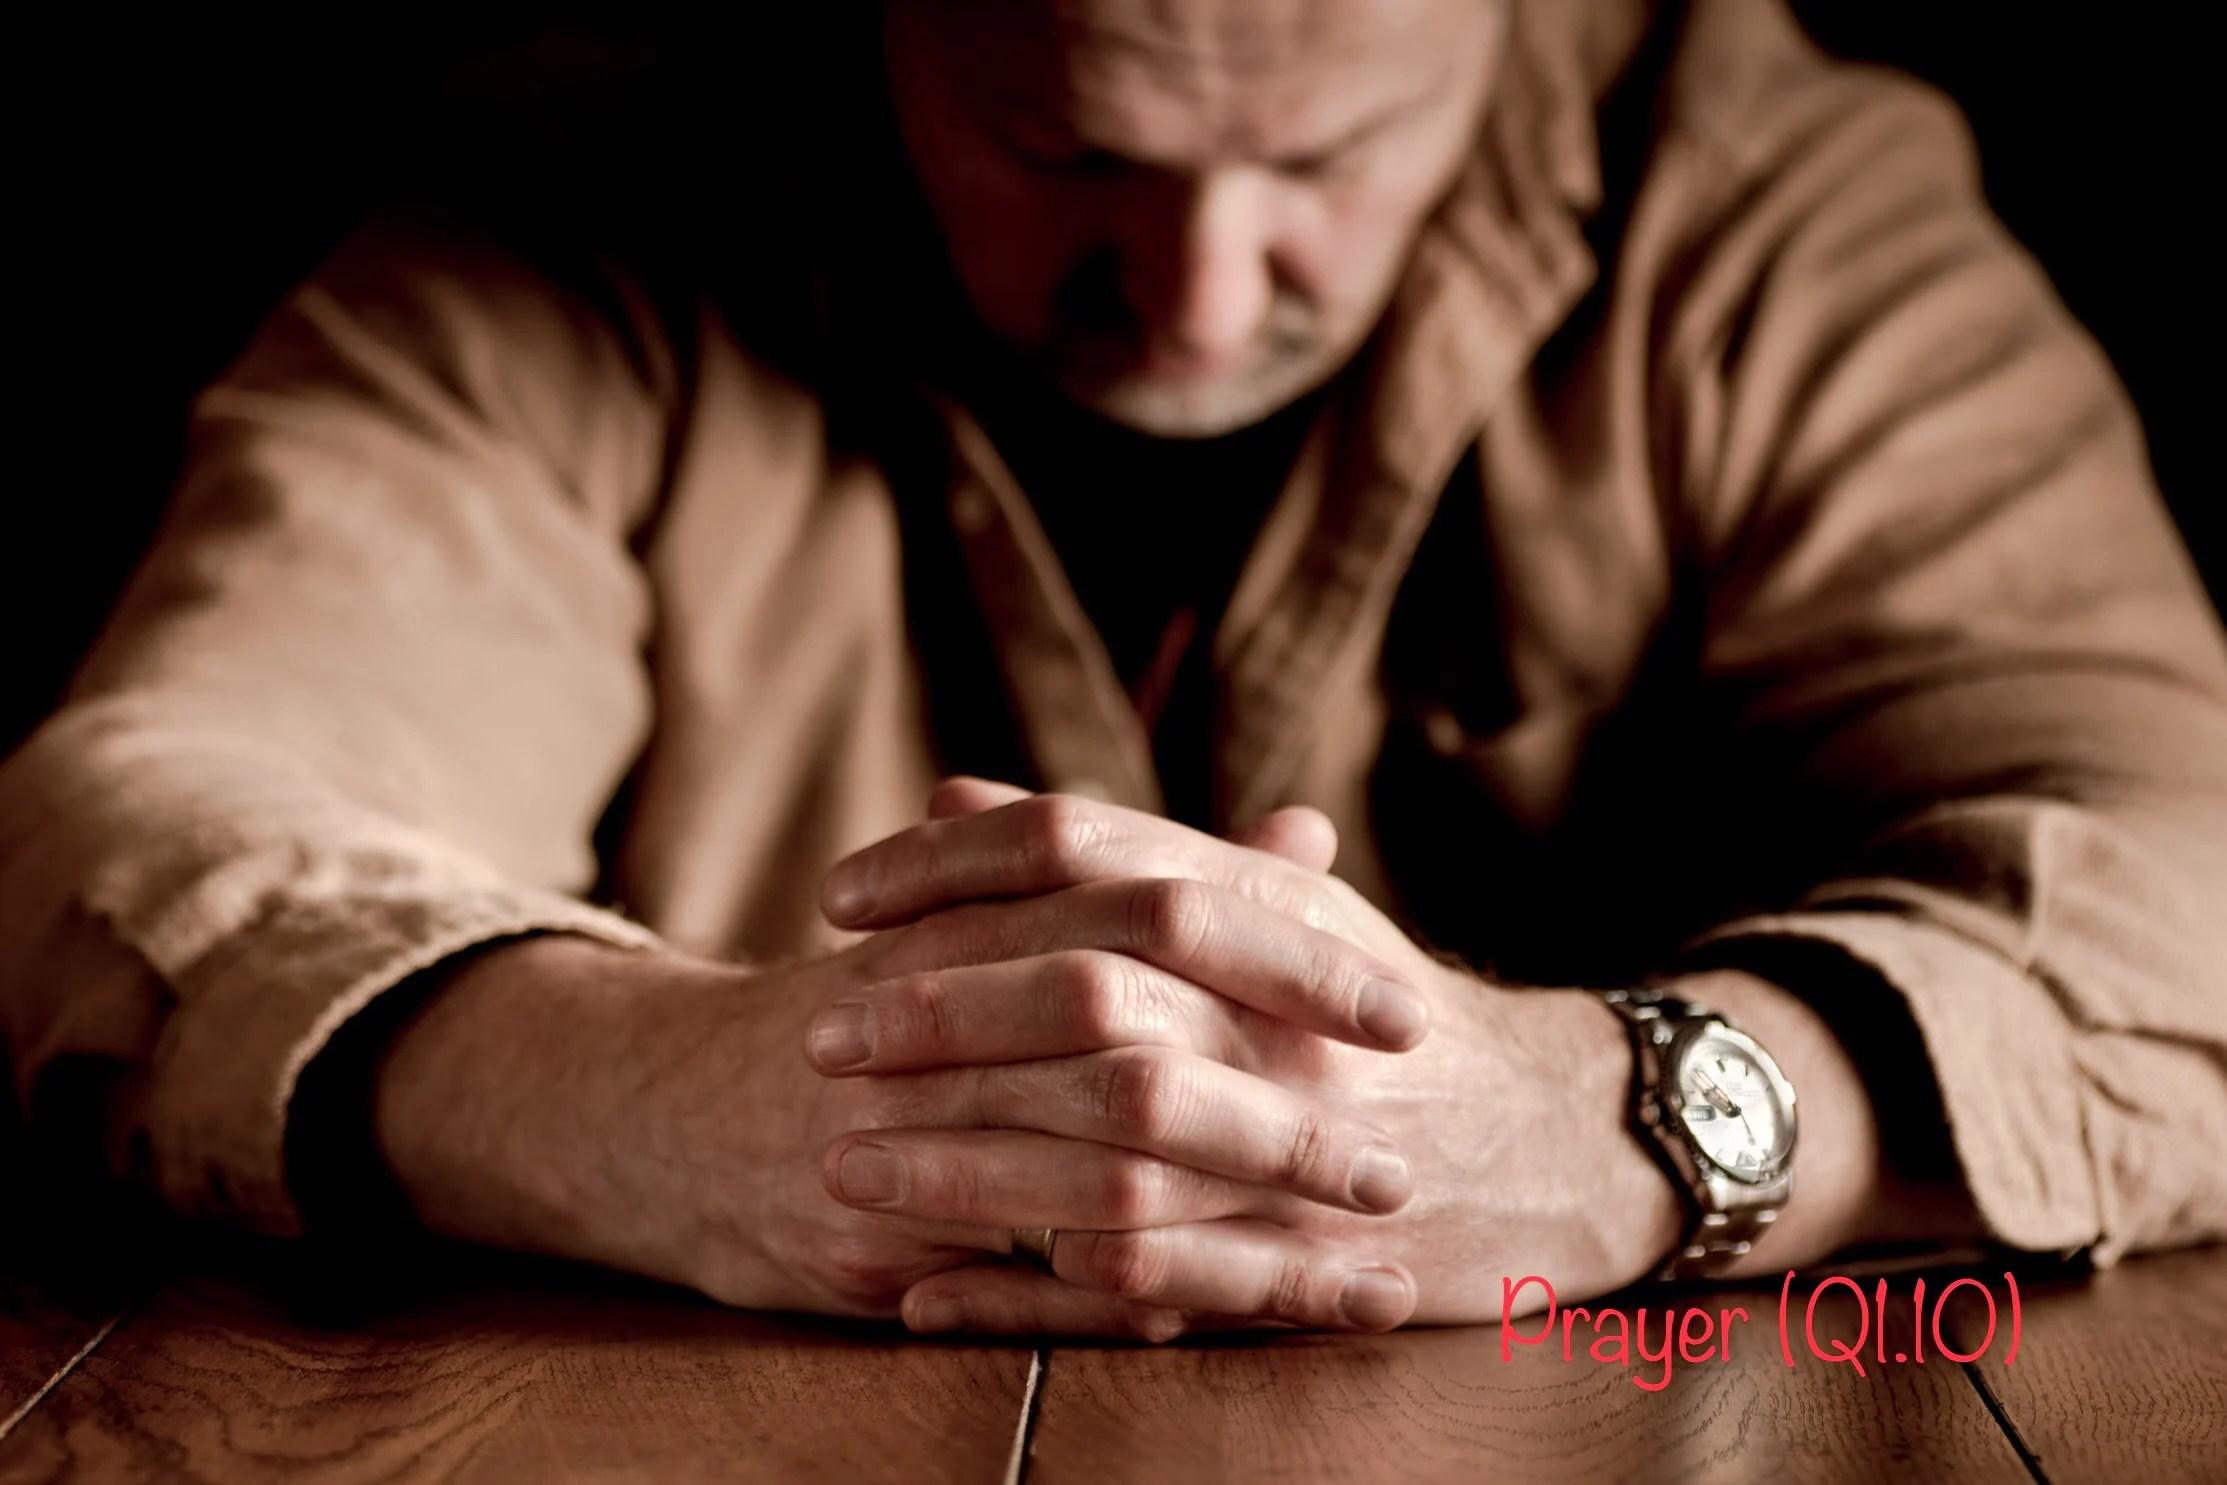 PRAYER (Q1.10)